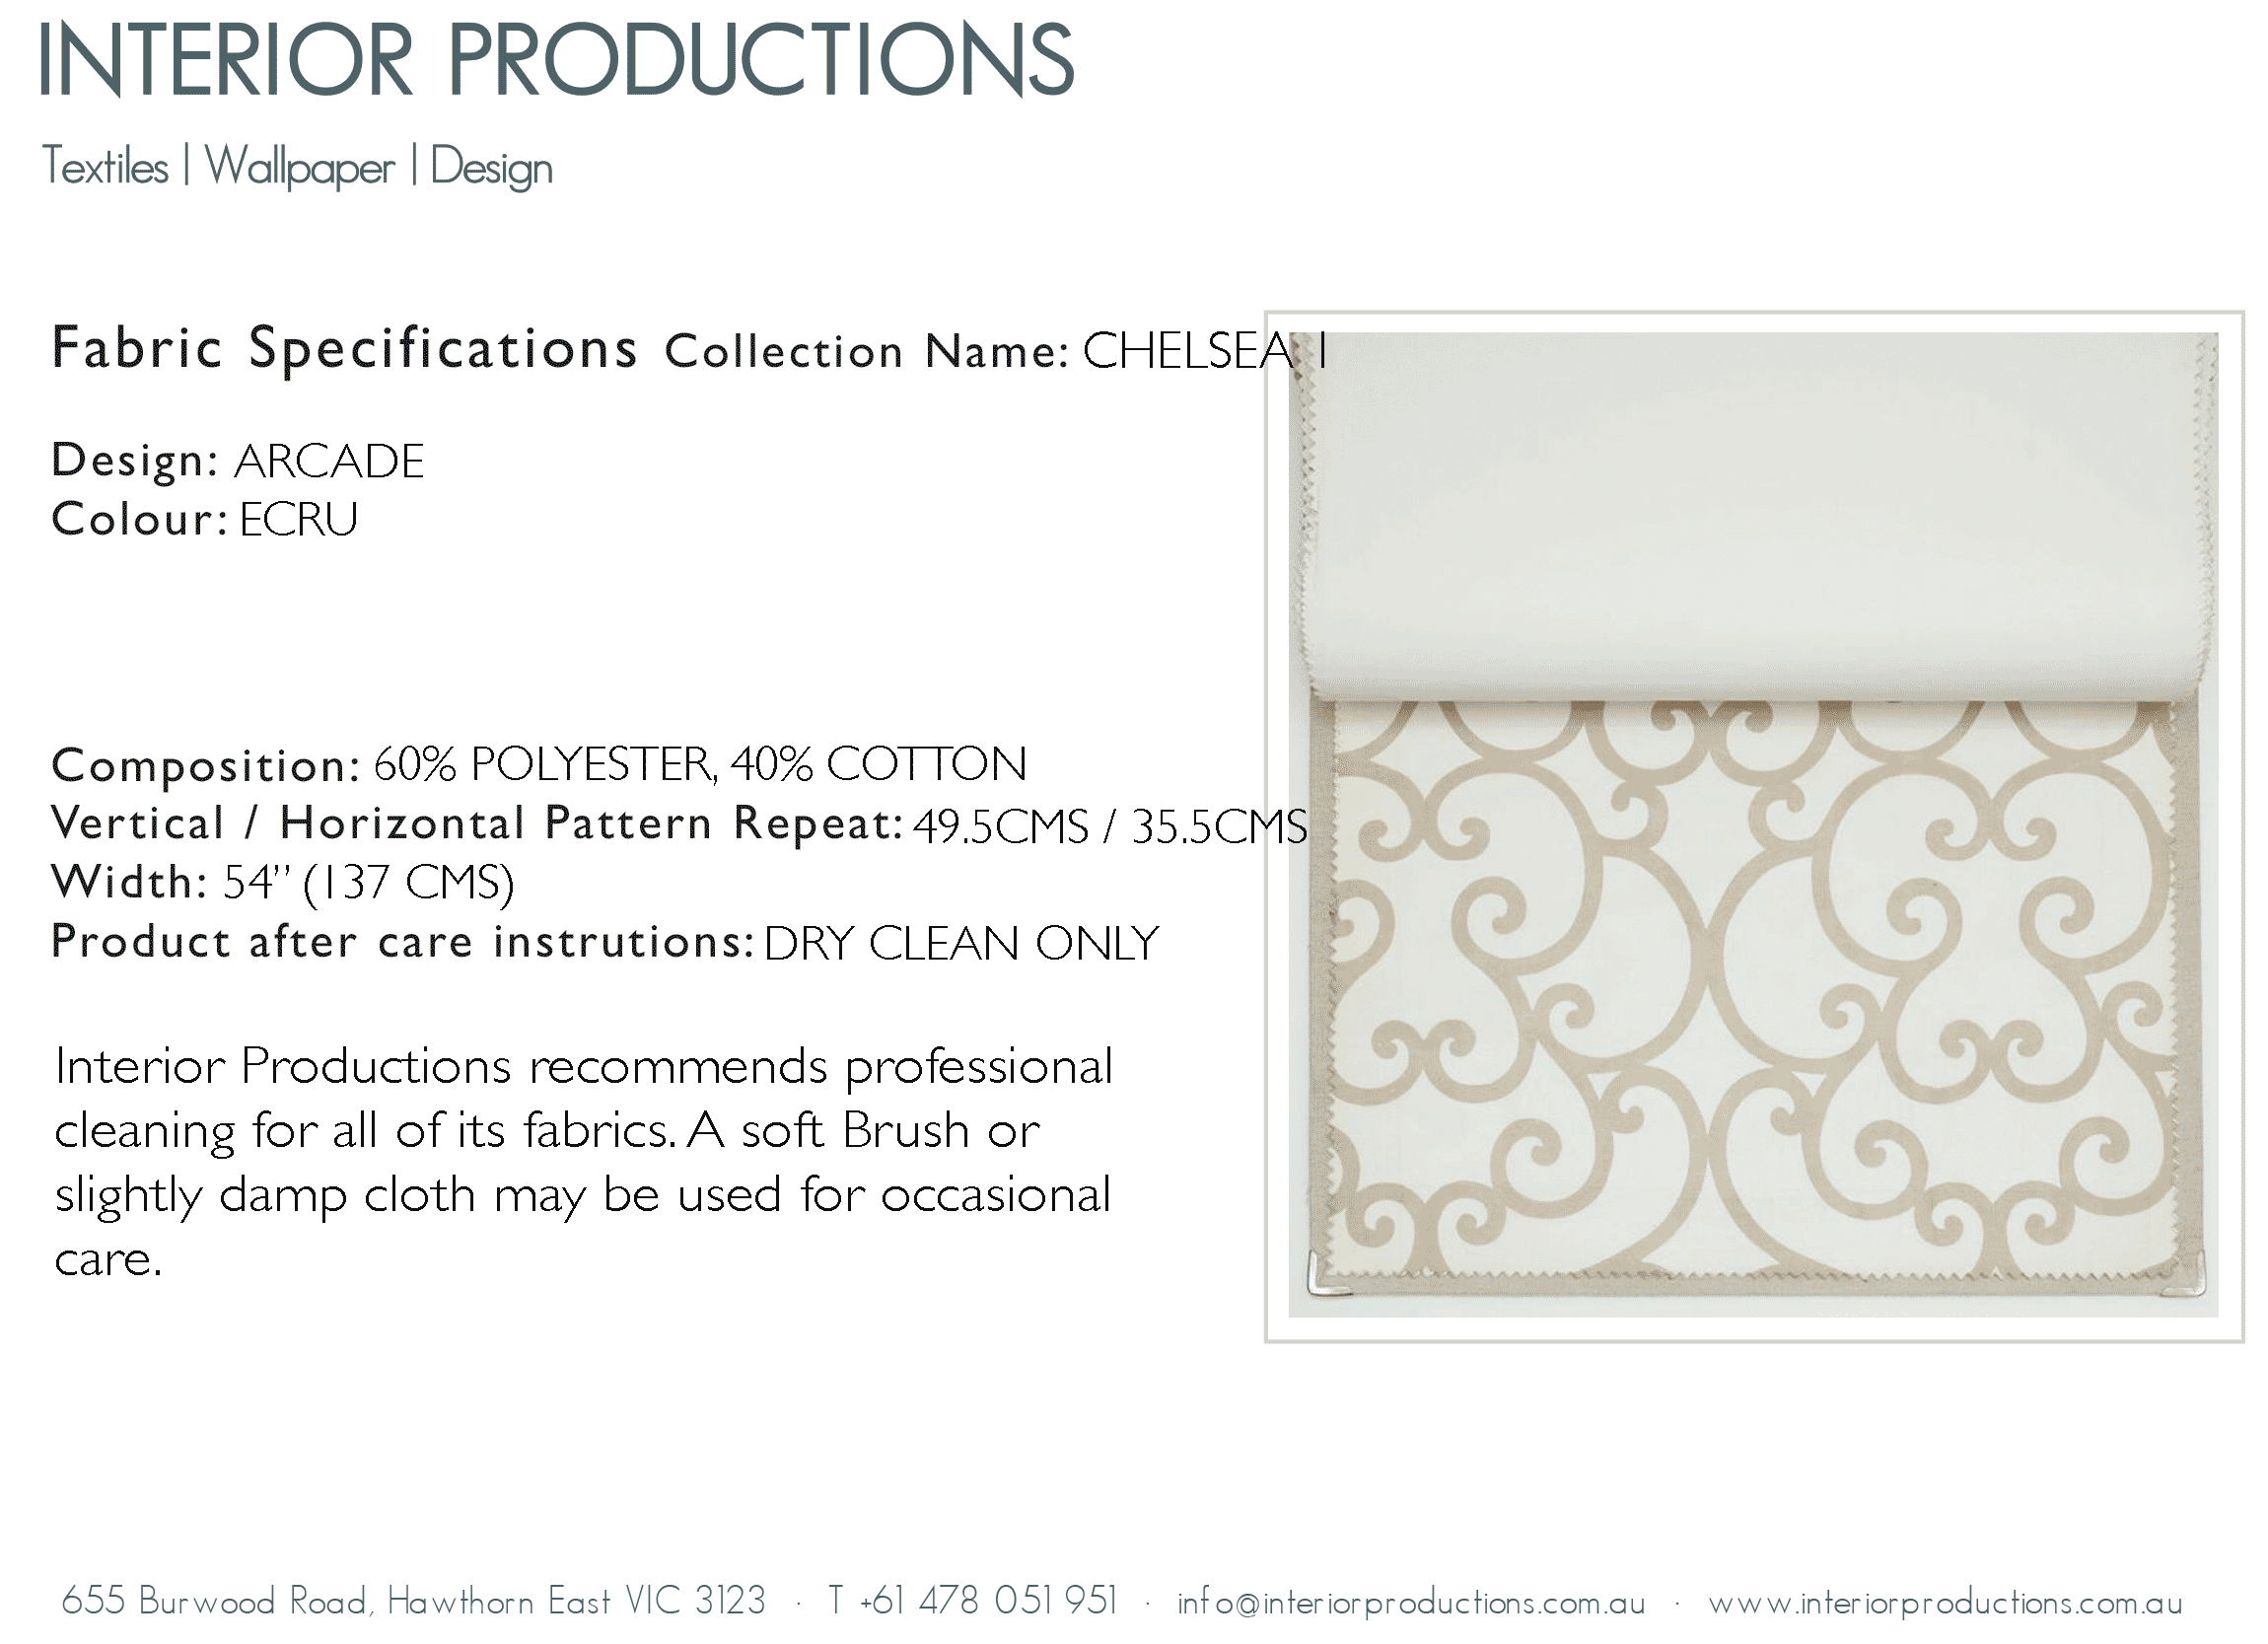 interior_productions_ARCADE---ECRU